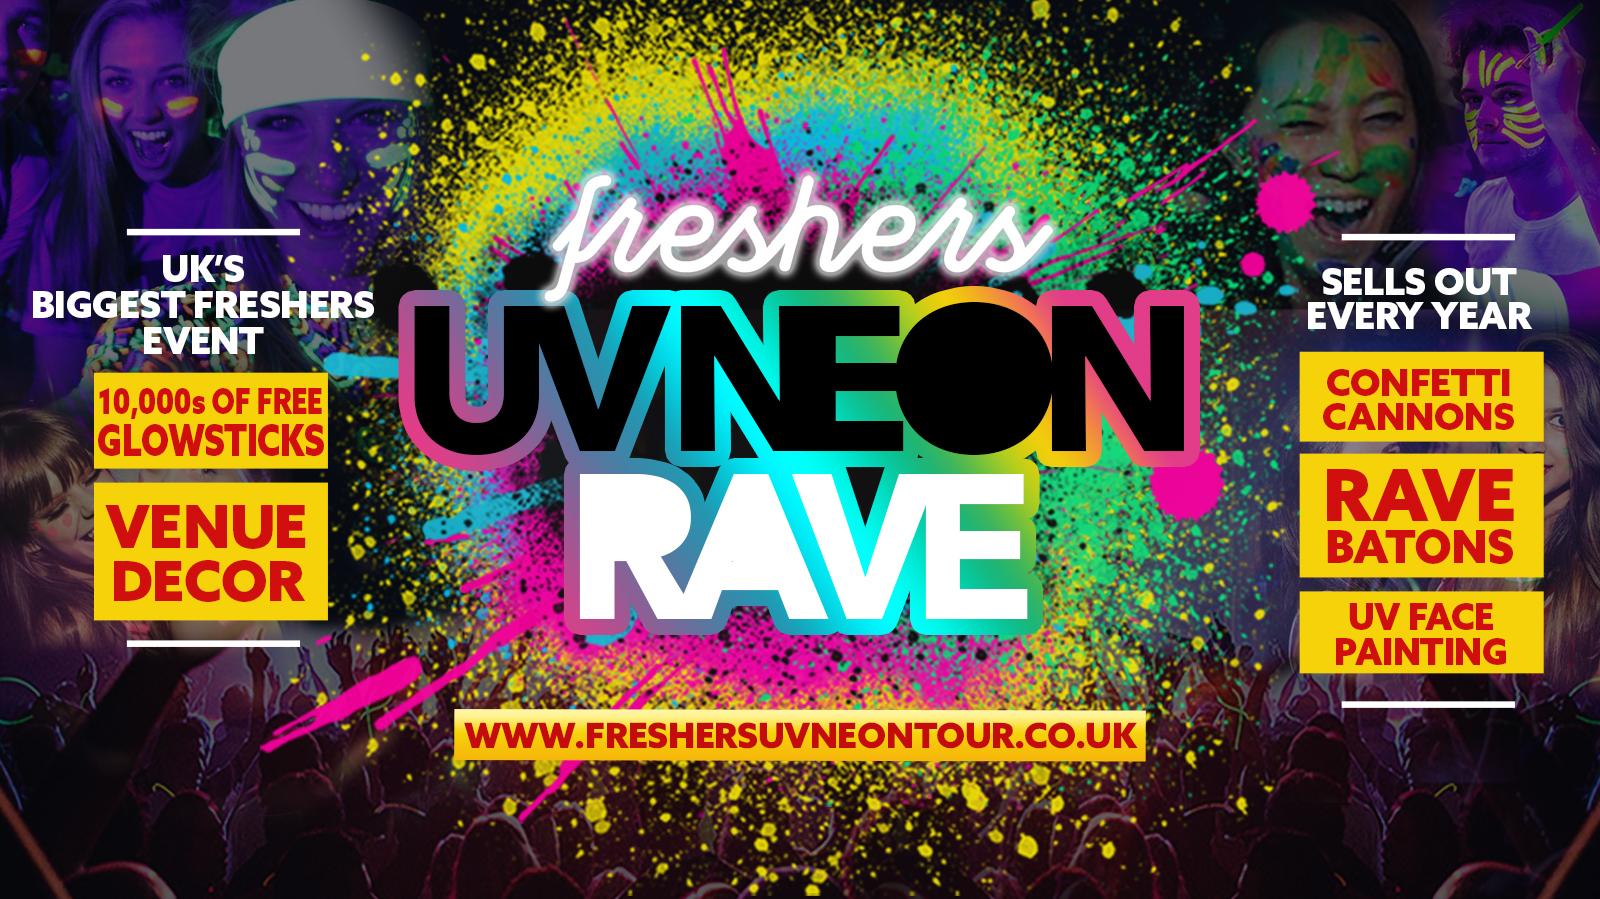 Nottingham Freshers UV Neon Rave   Nottingham Freshers Week 2021